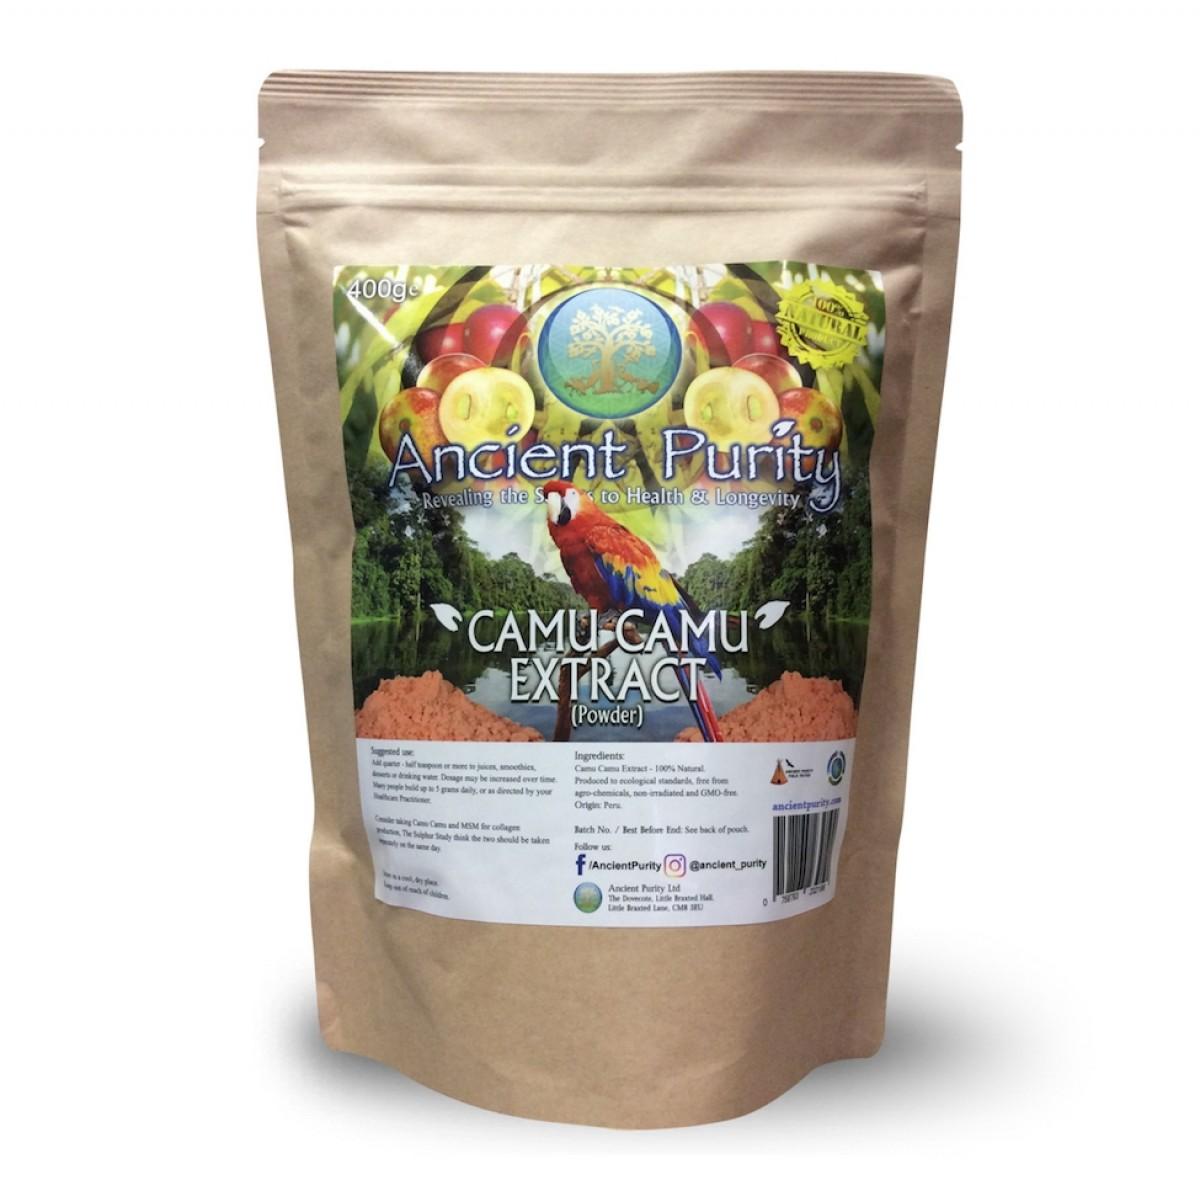 Camu Camu Extract Organic Fruit Vitamin C Ancient